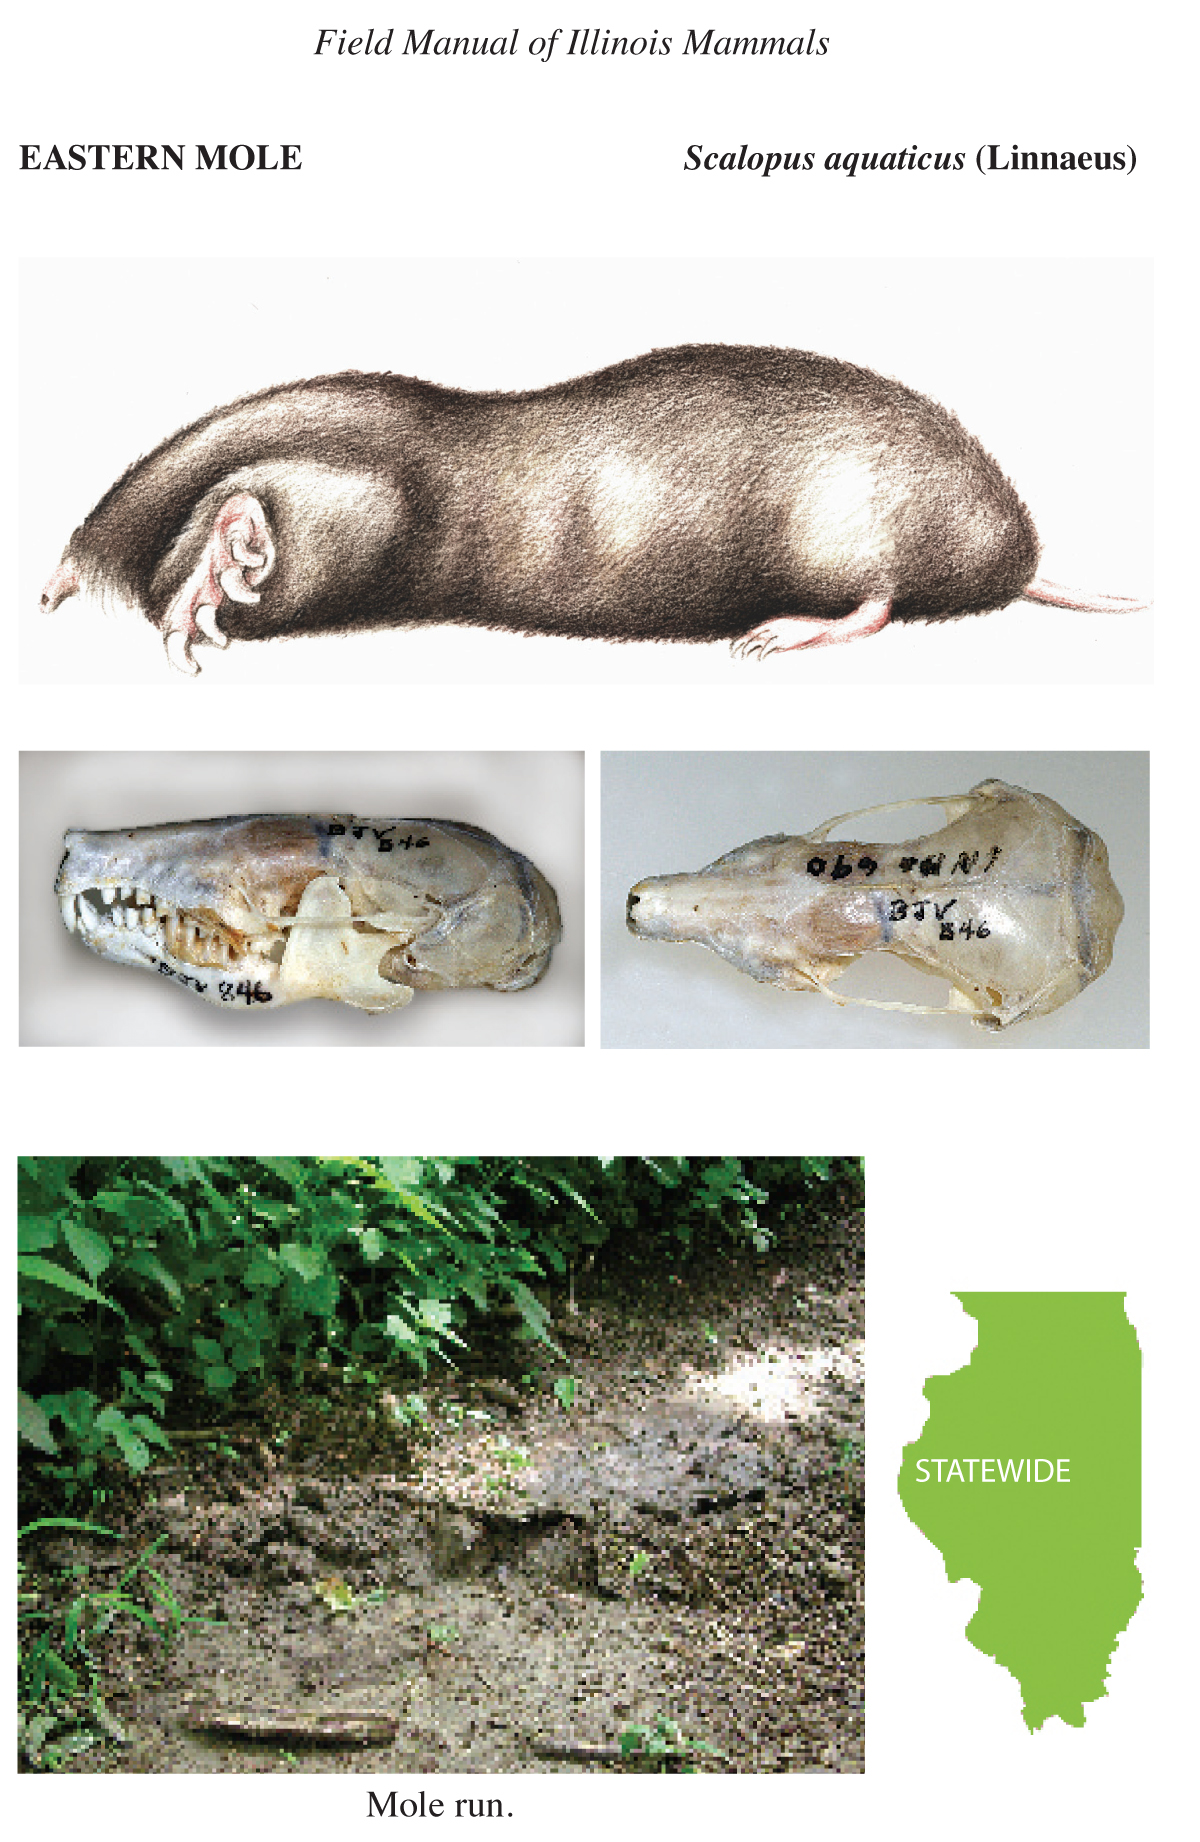 eastern mole illustration, skull images, mole run photo, and illinois distribution map